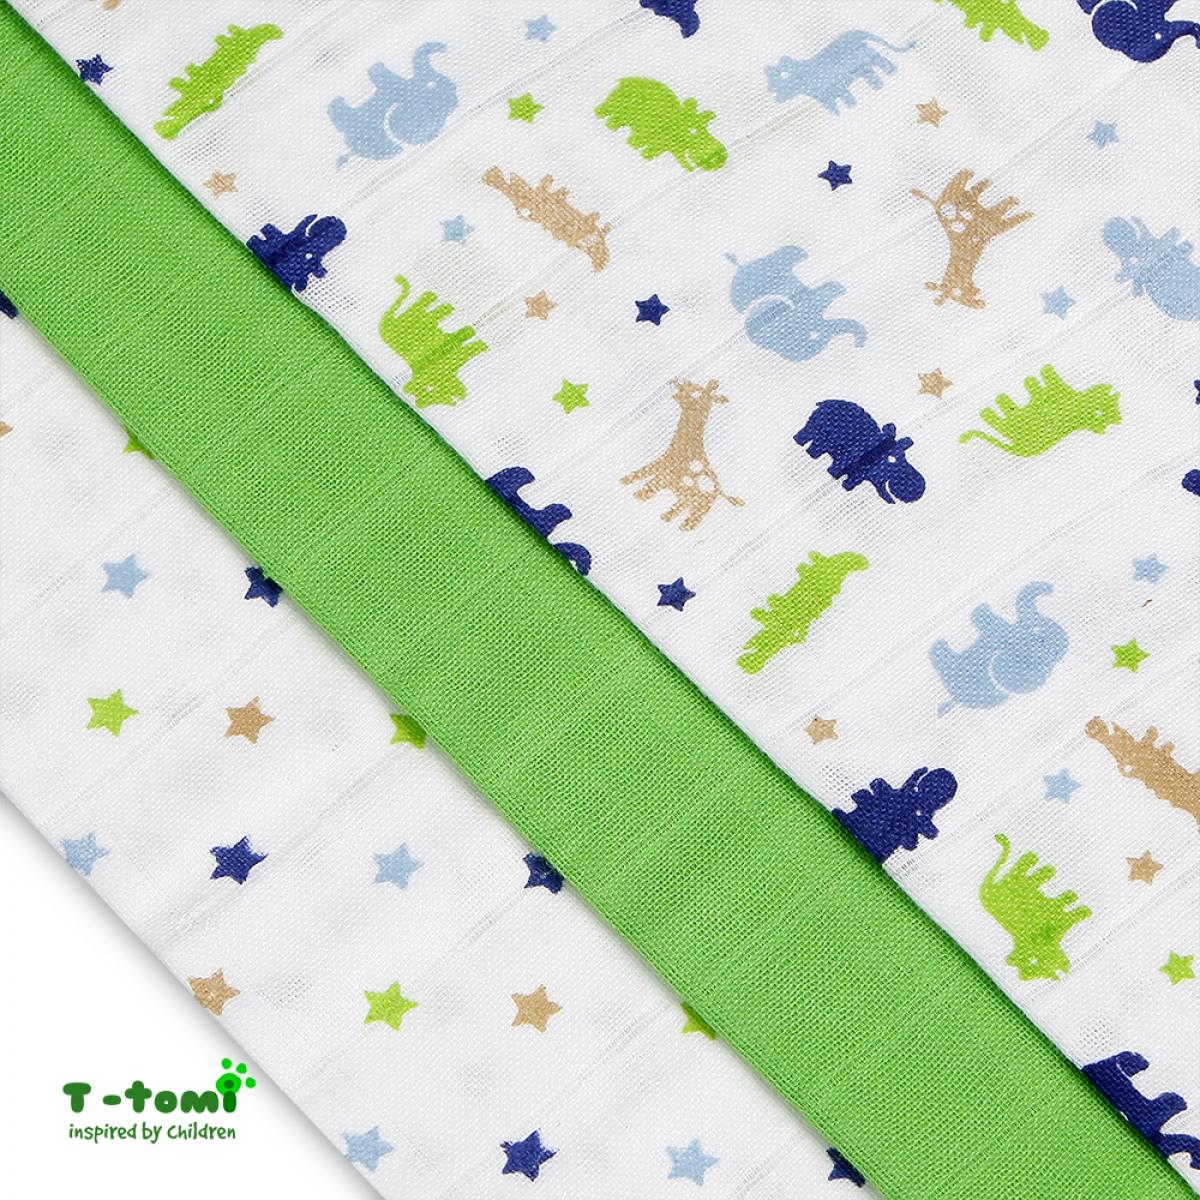 TETRA_zeleni_krokodyli_detail-1200x1200